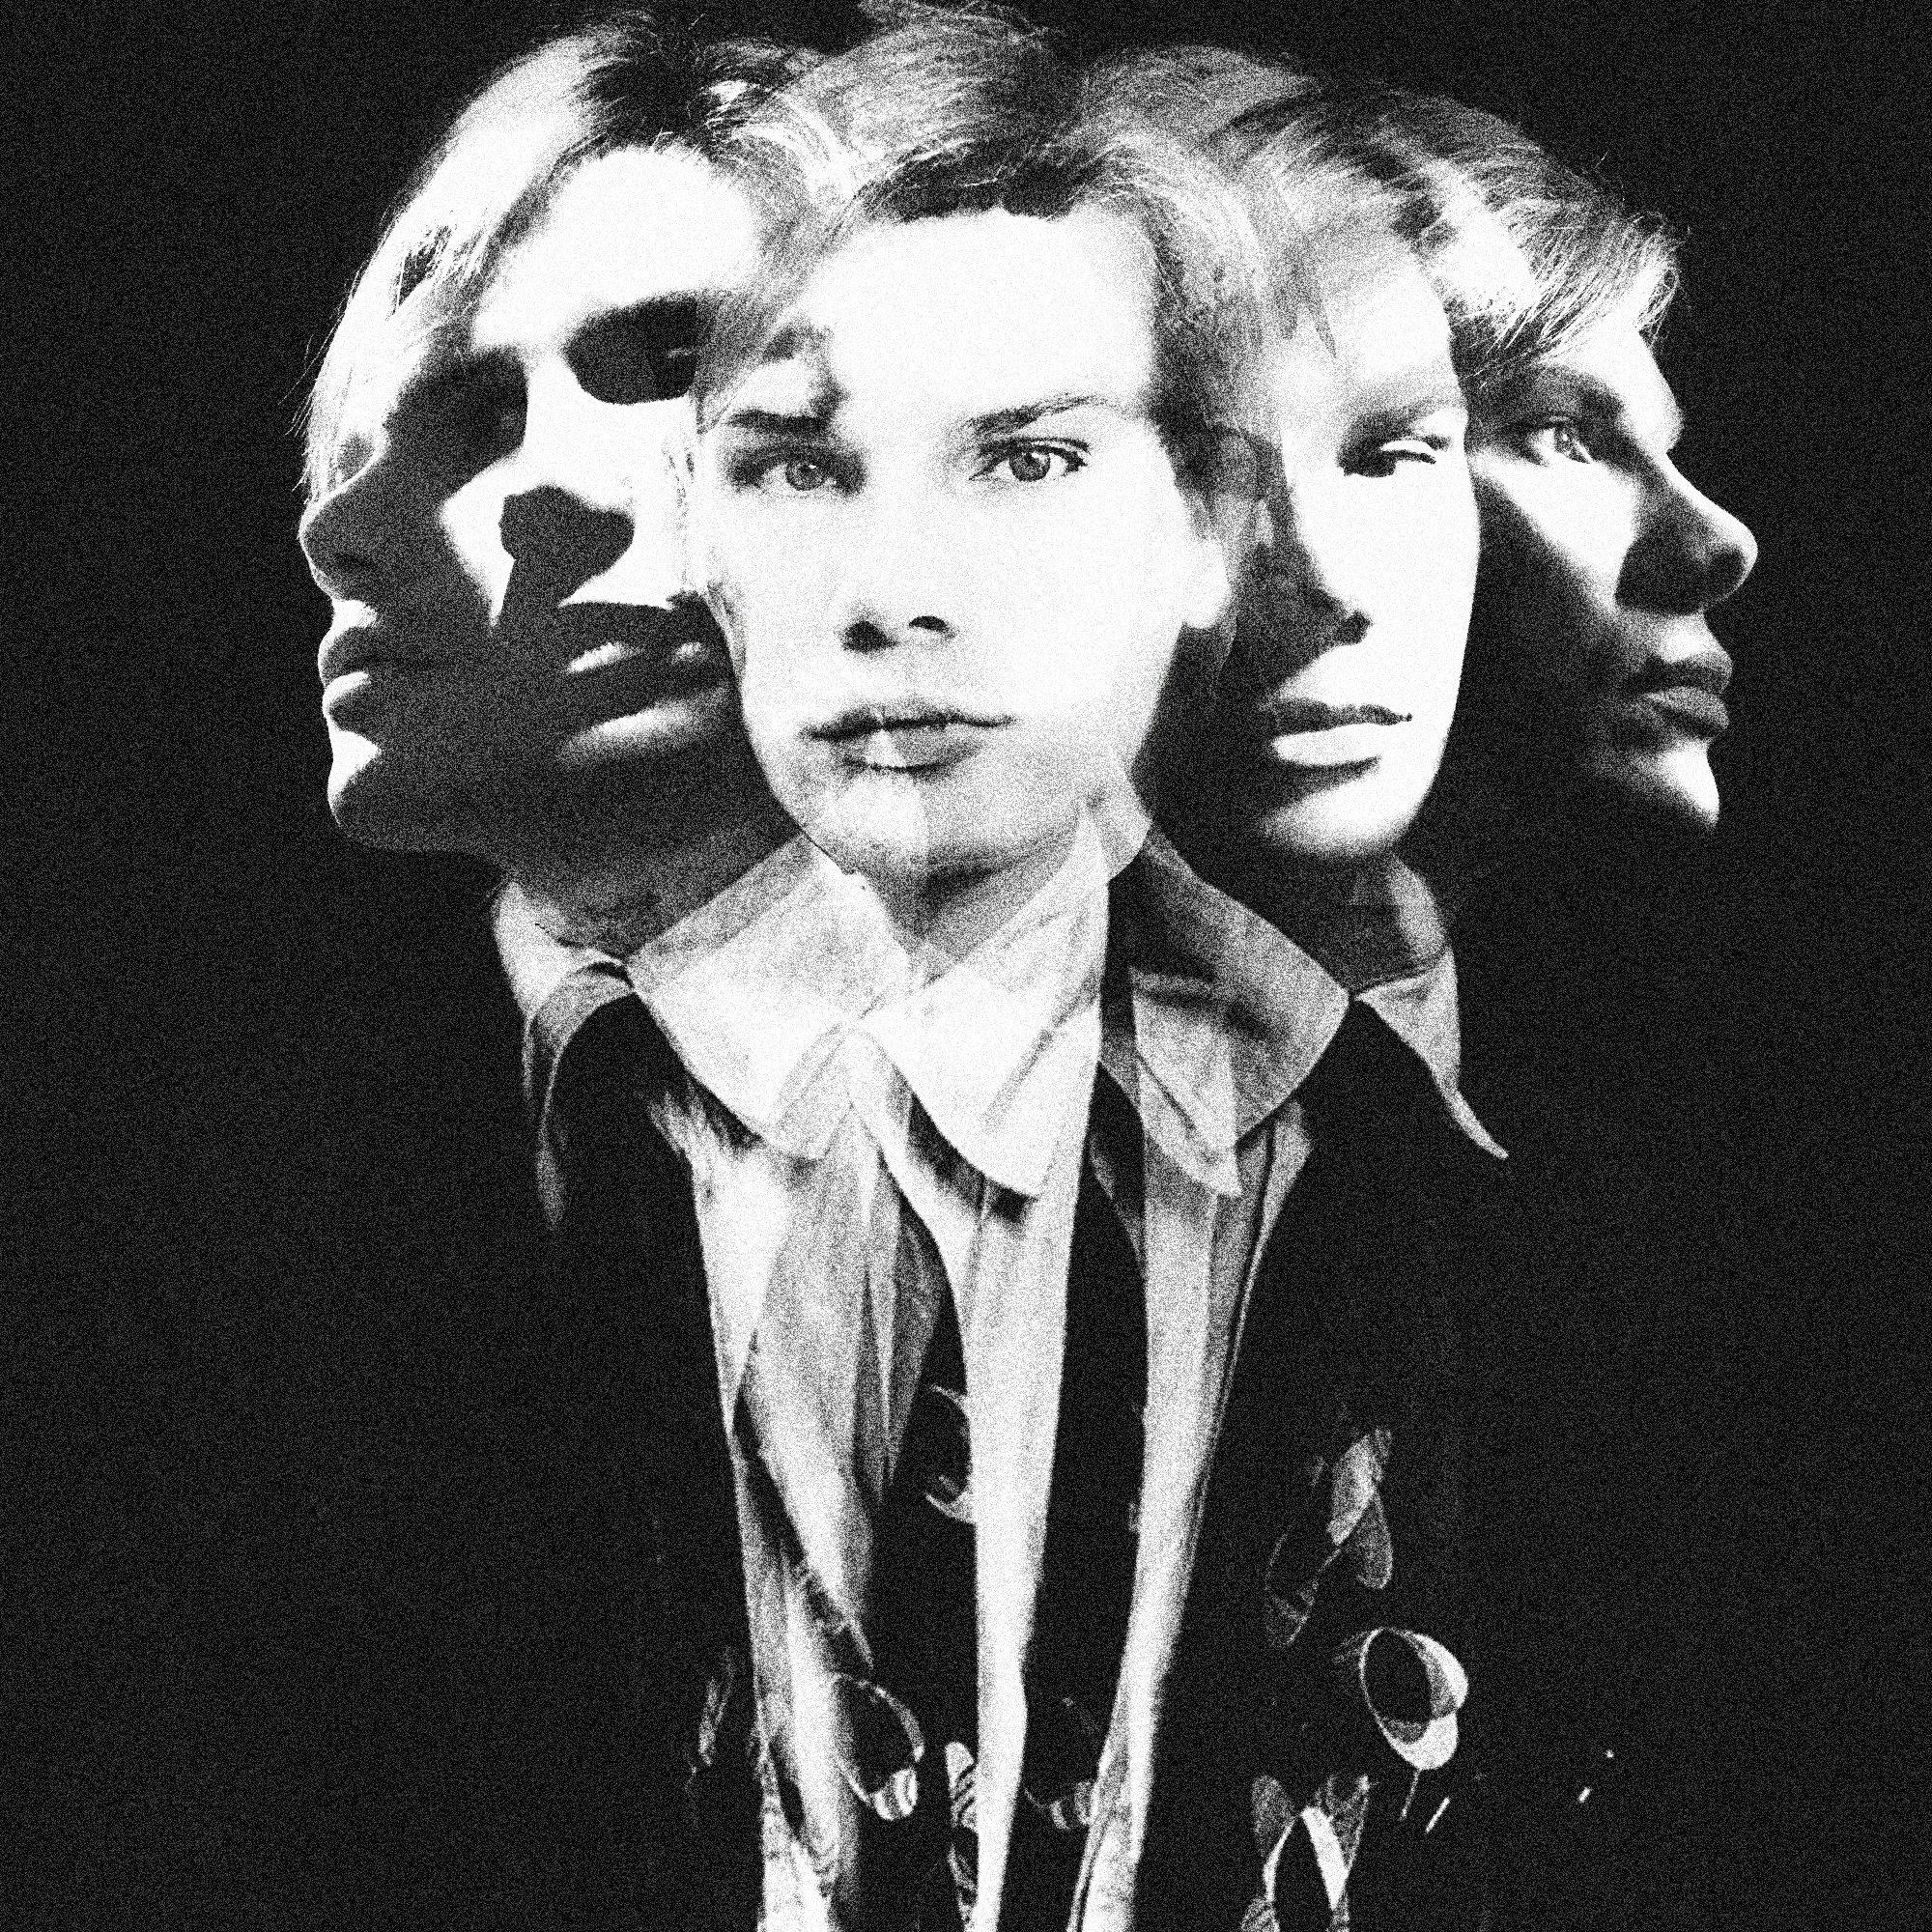 """WharoLism-This not by me"", la mostra virtuale del pittore abruzzese Vincenzo Bonanni"